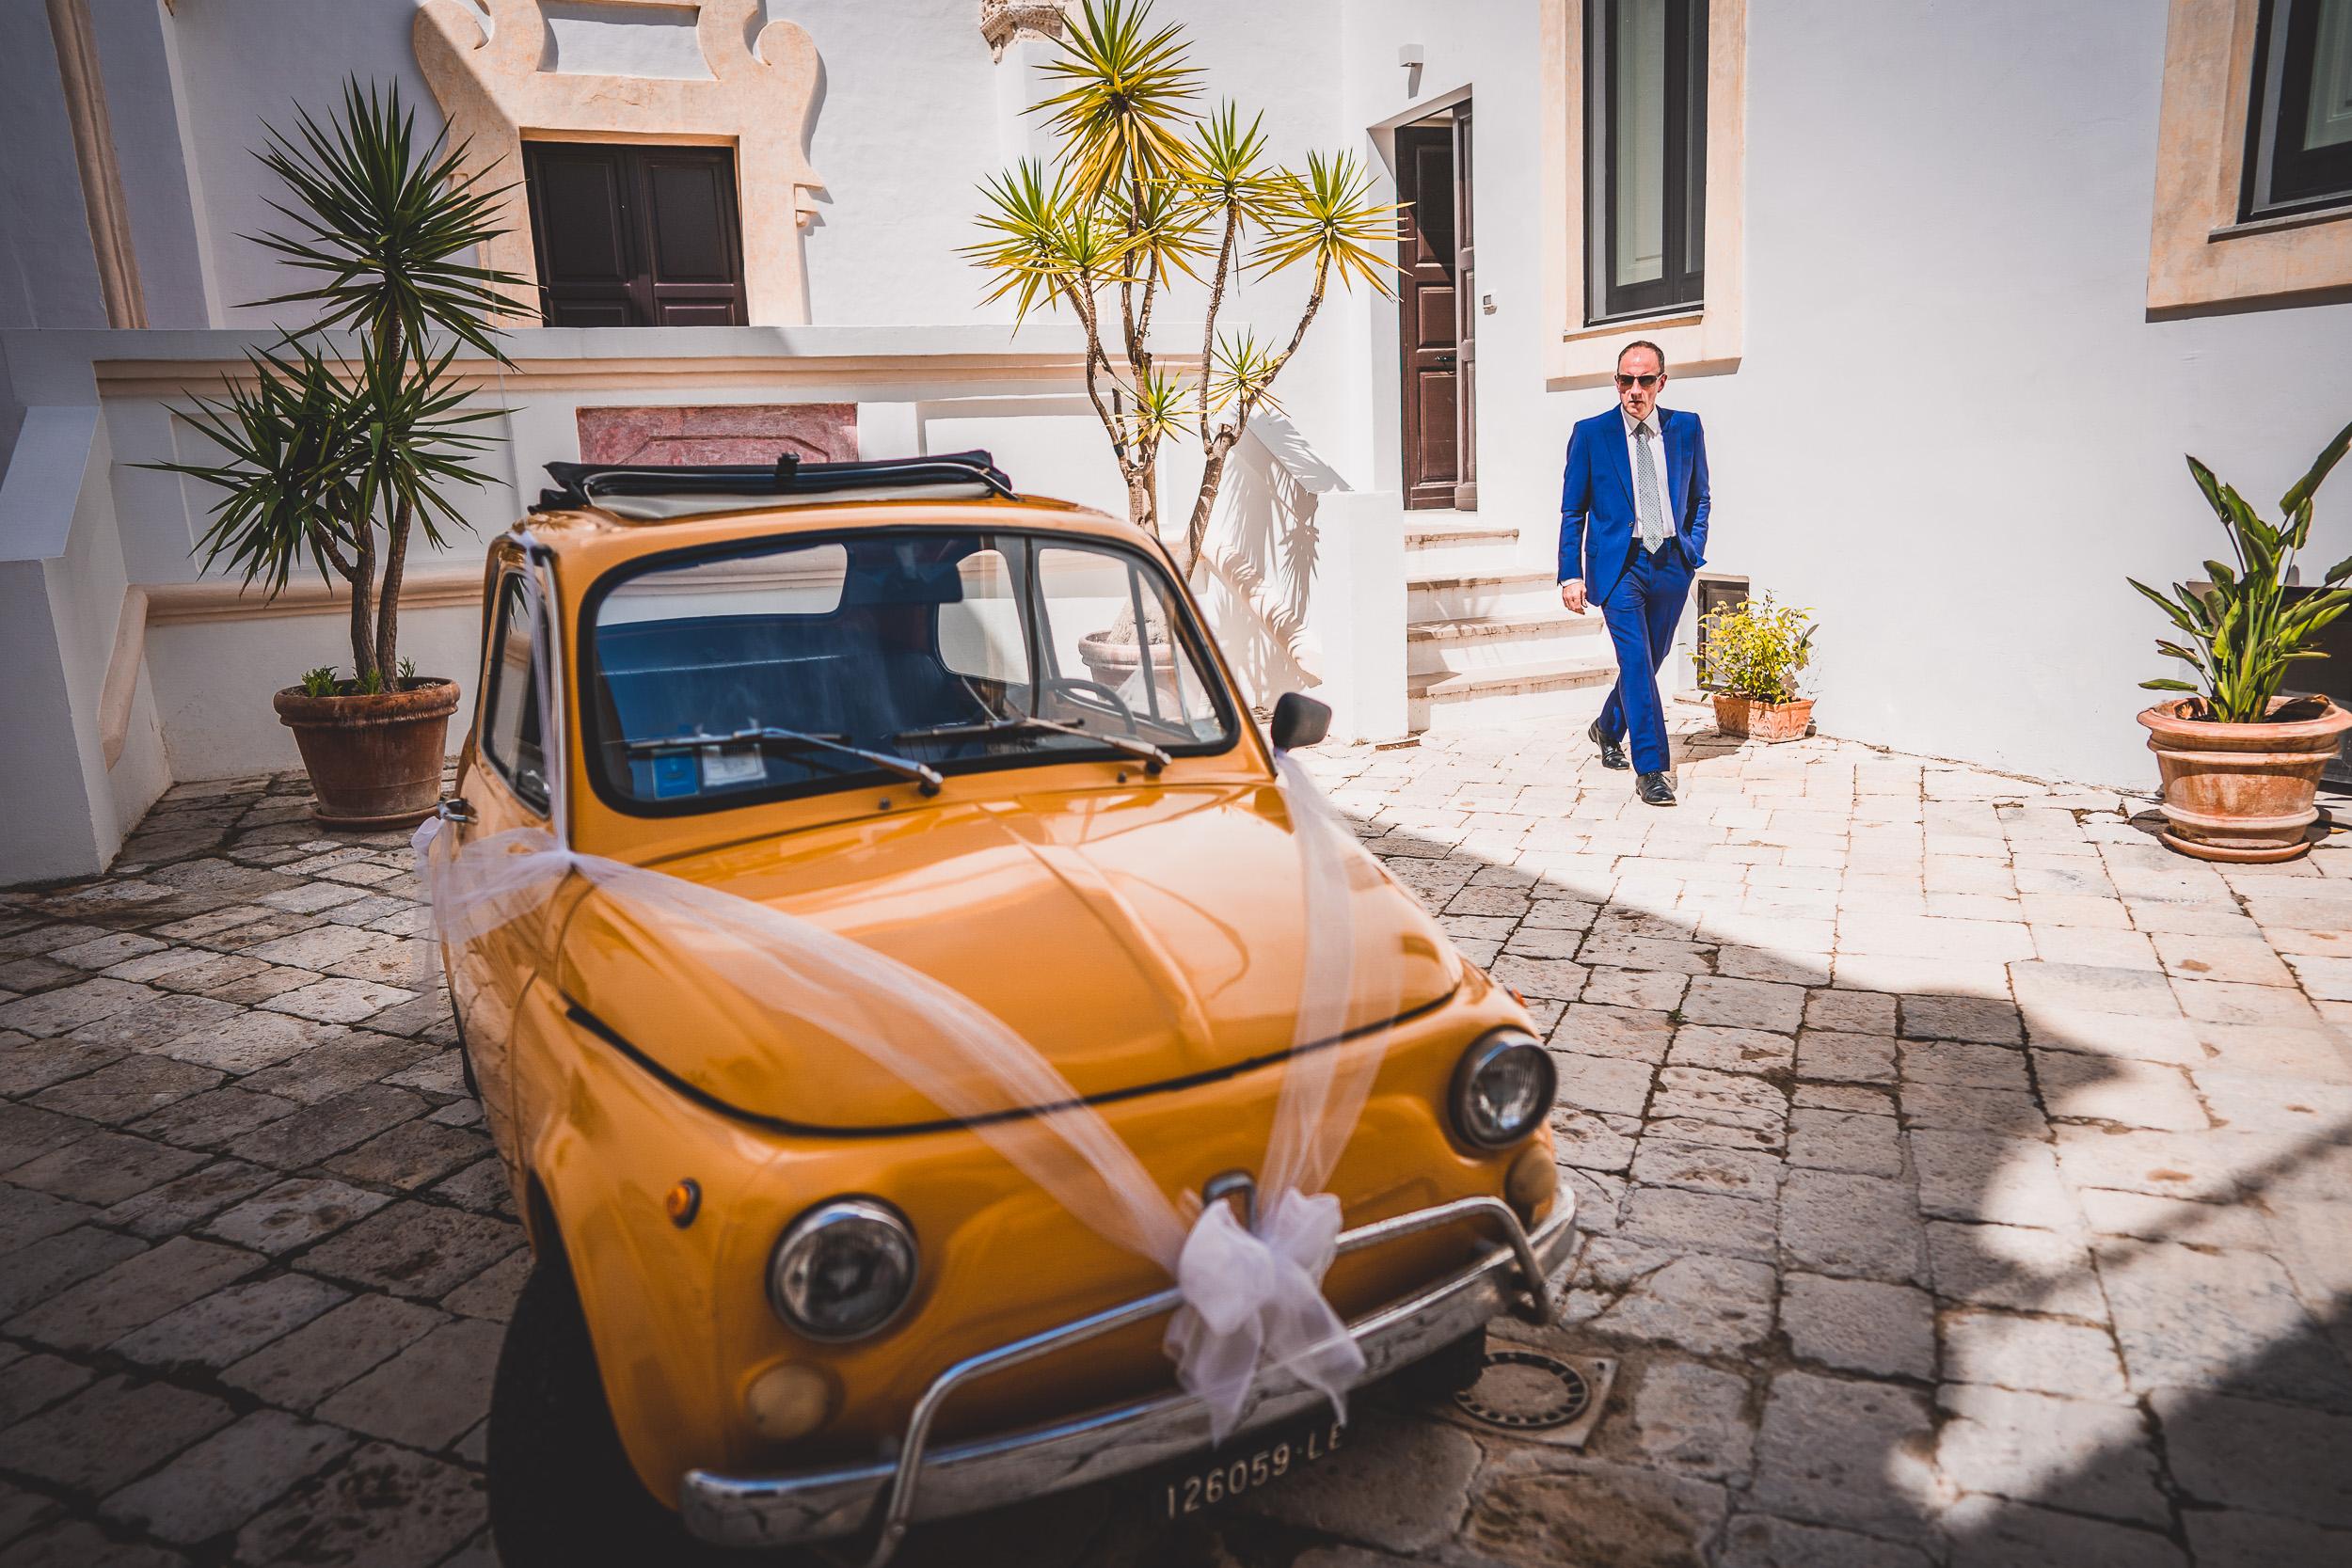 Destination wedding photography | Anna & Nigel destination wedding photography 013